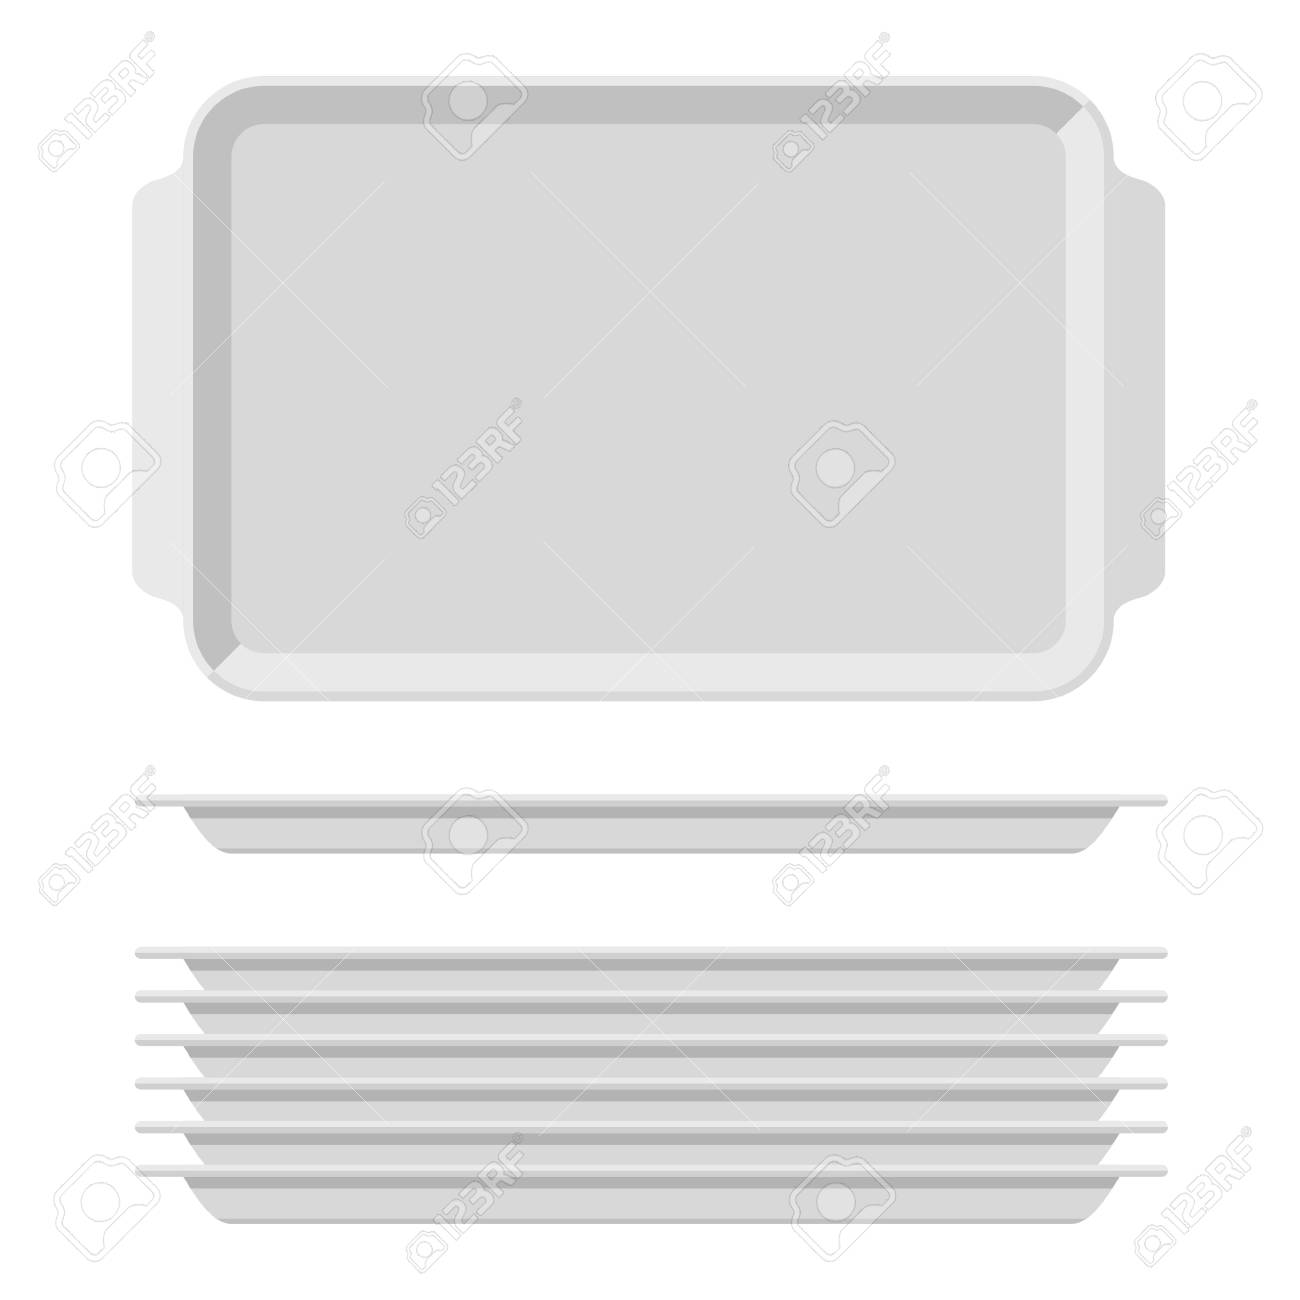 White Blank Food Tray Set With Handles. Rectangular Kitchen Salvers ...